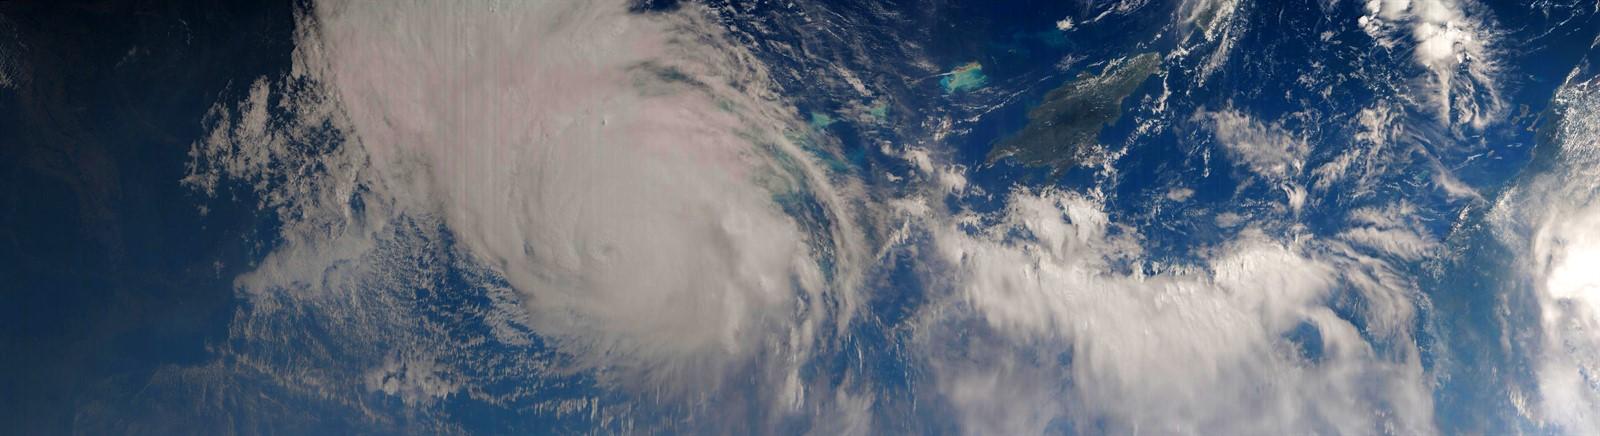 Irma 10 wide v11 PR01 CREDIT Visidyne 1600